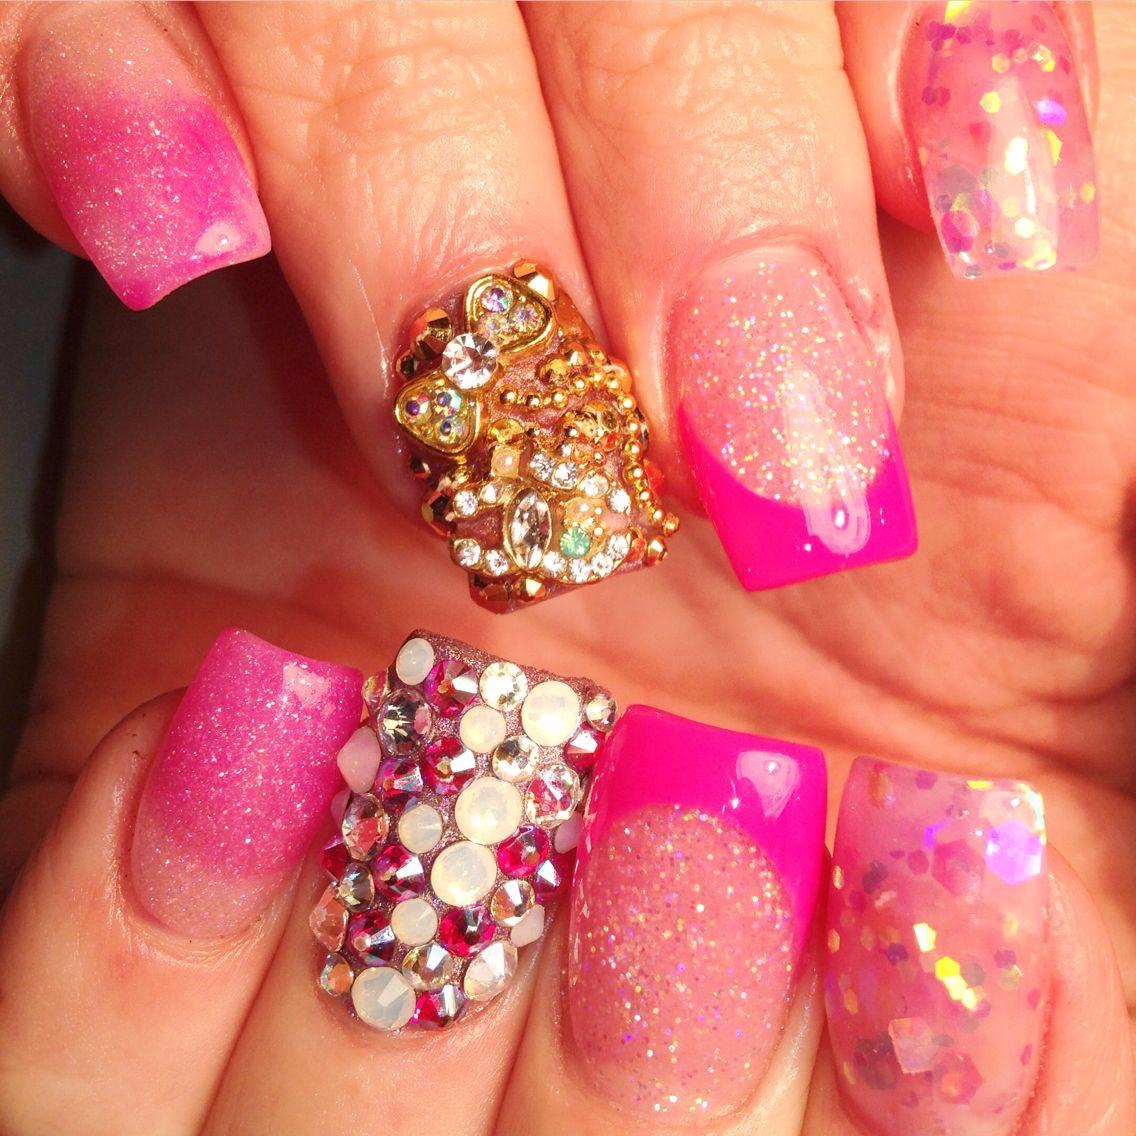 #acrylic #gel #junknail #bling #ombre #glitter